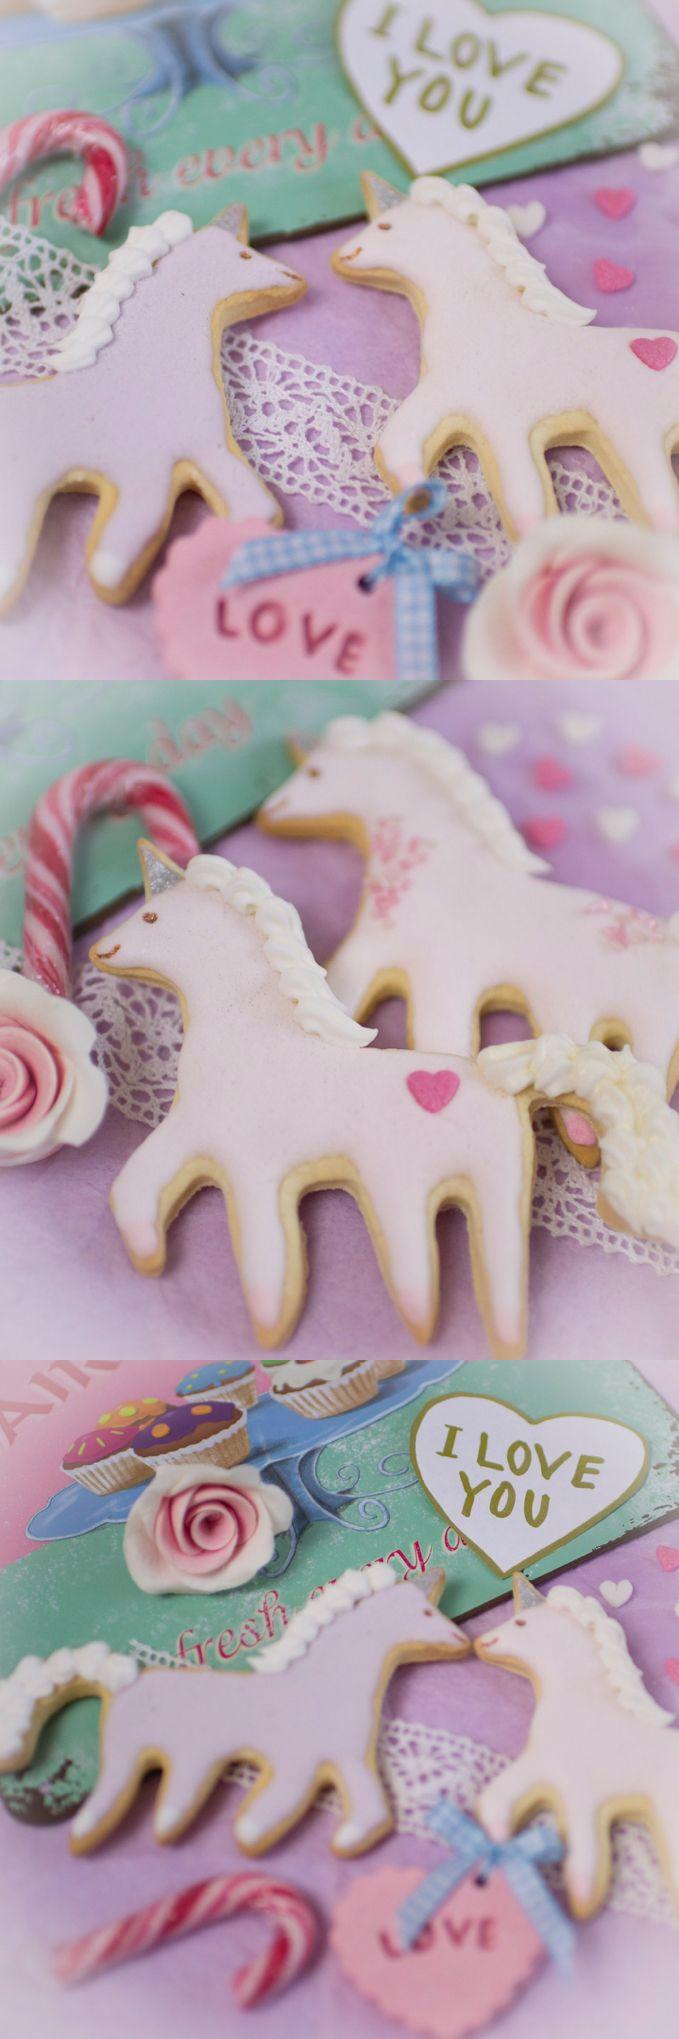 frau zuckerfee einhorn kekse anleitung kekse verzieren royal icing unicorn cookies cookie. Black Bedroom Furniture Sets. Home Design Ideas